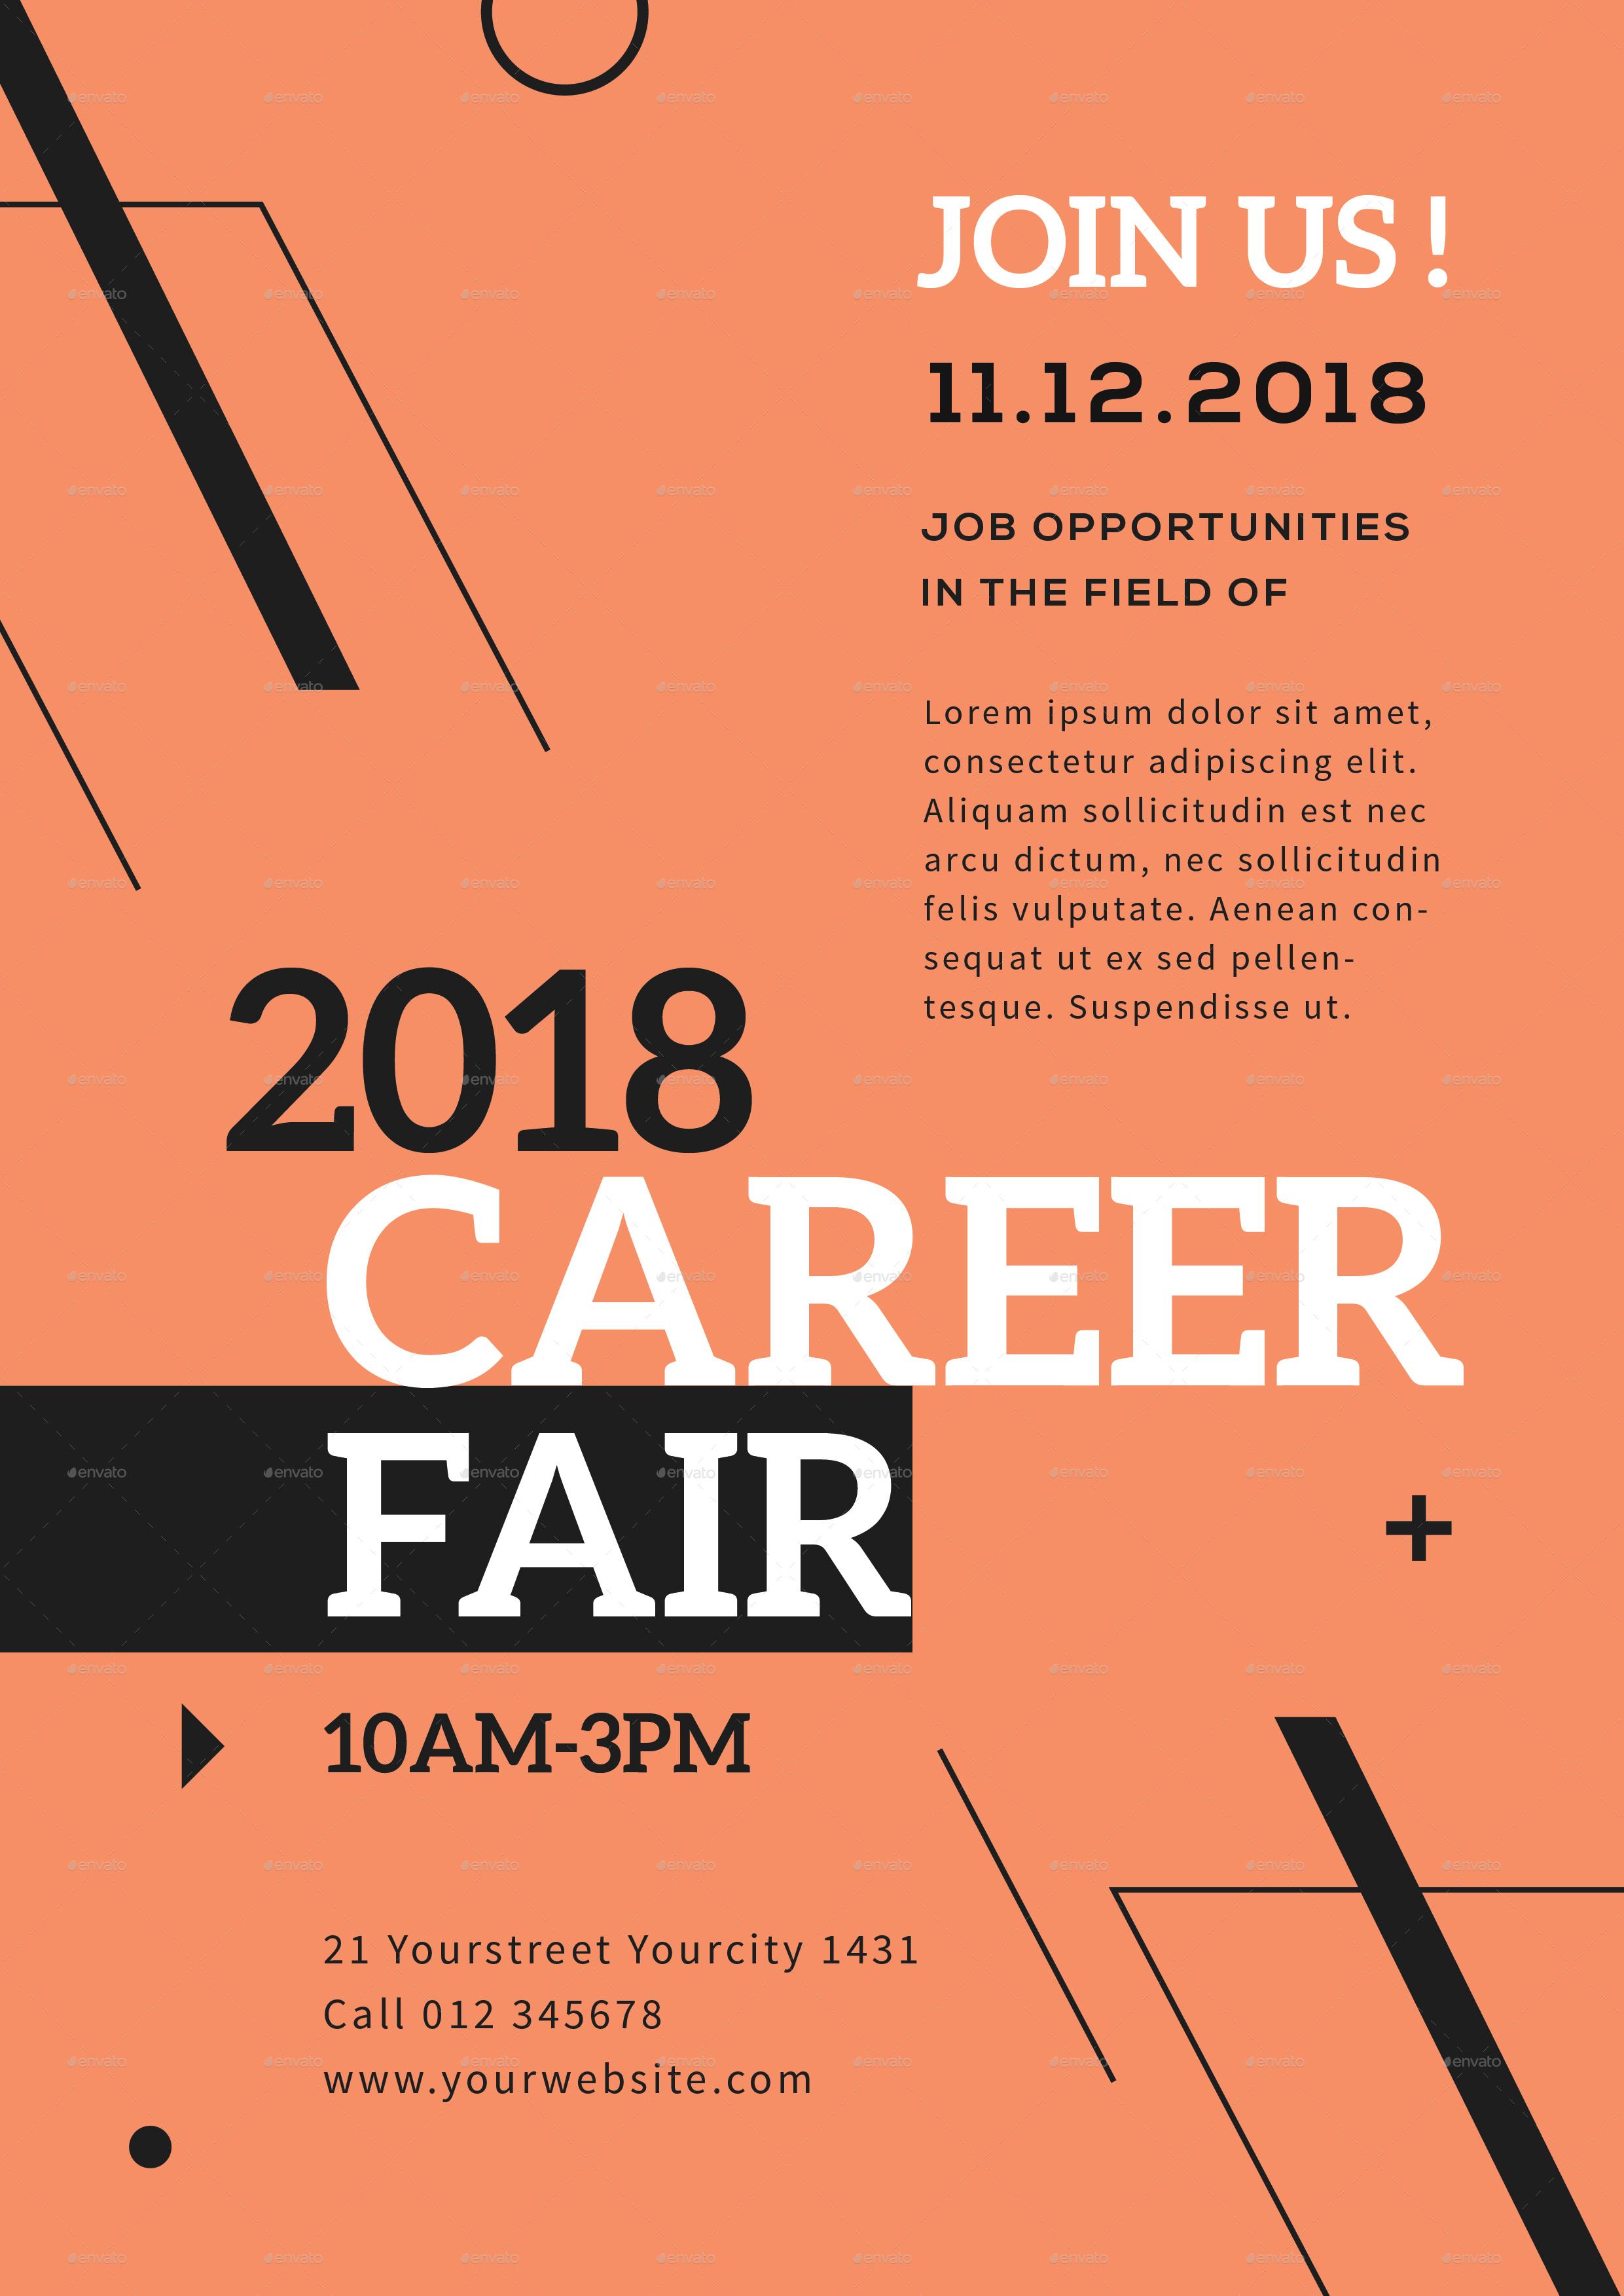 career fair flyer by infinite78910